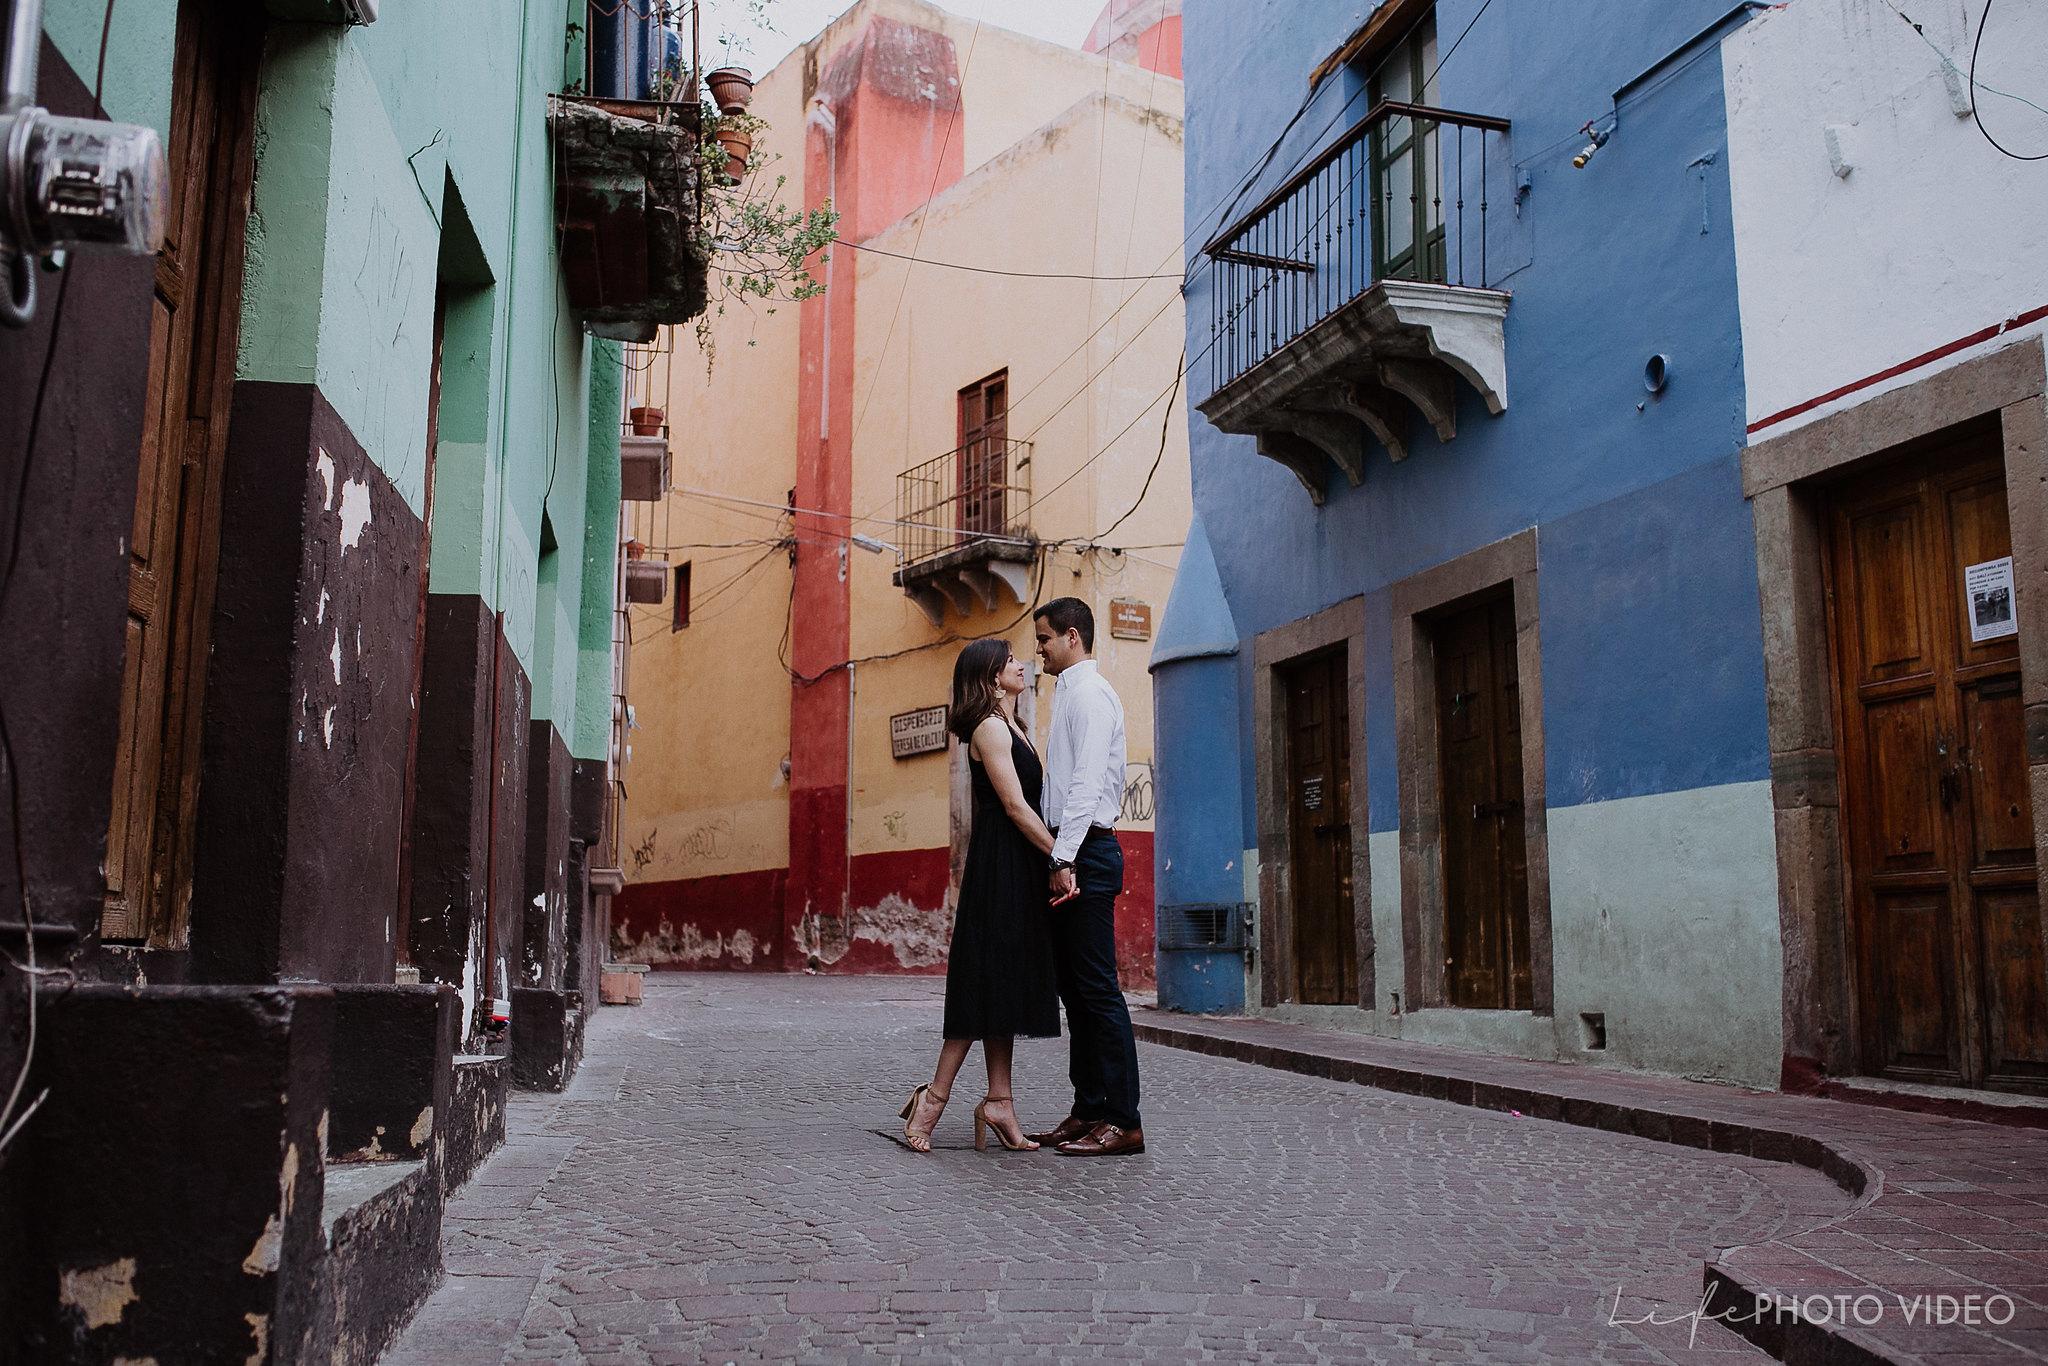 171217_Guanajuato_Photographer_0013